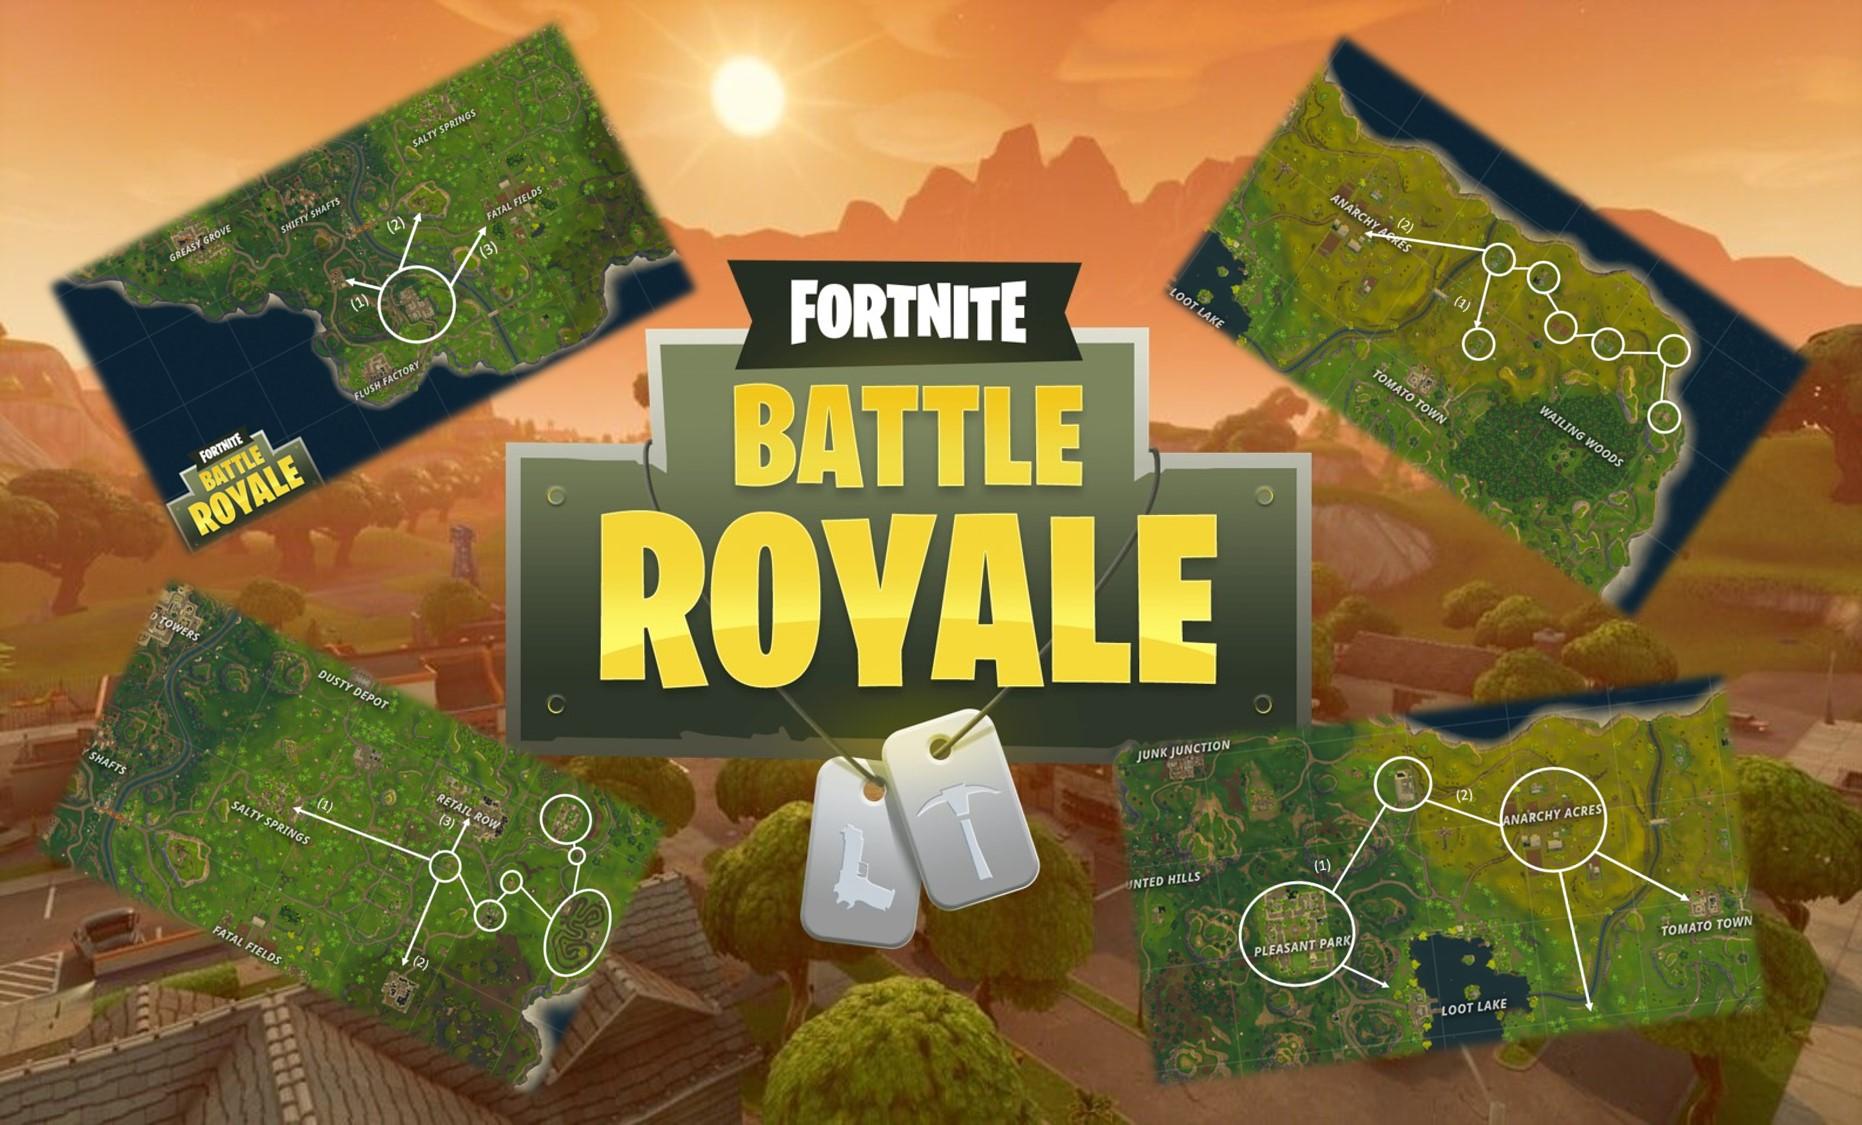 Nutze Die Map Die Besten Loot Routen In Fortnite Battle Royale